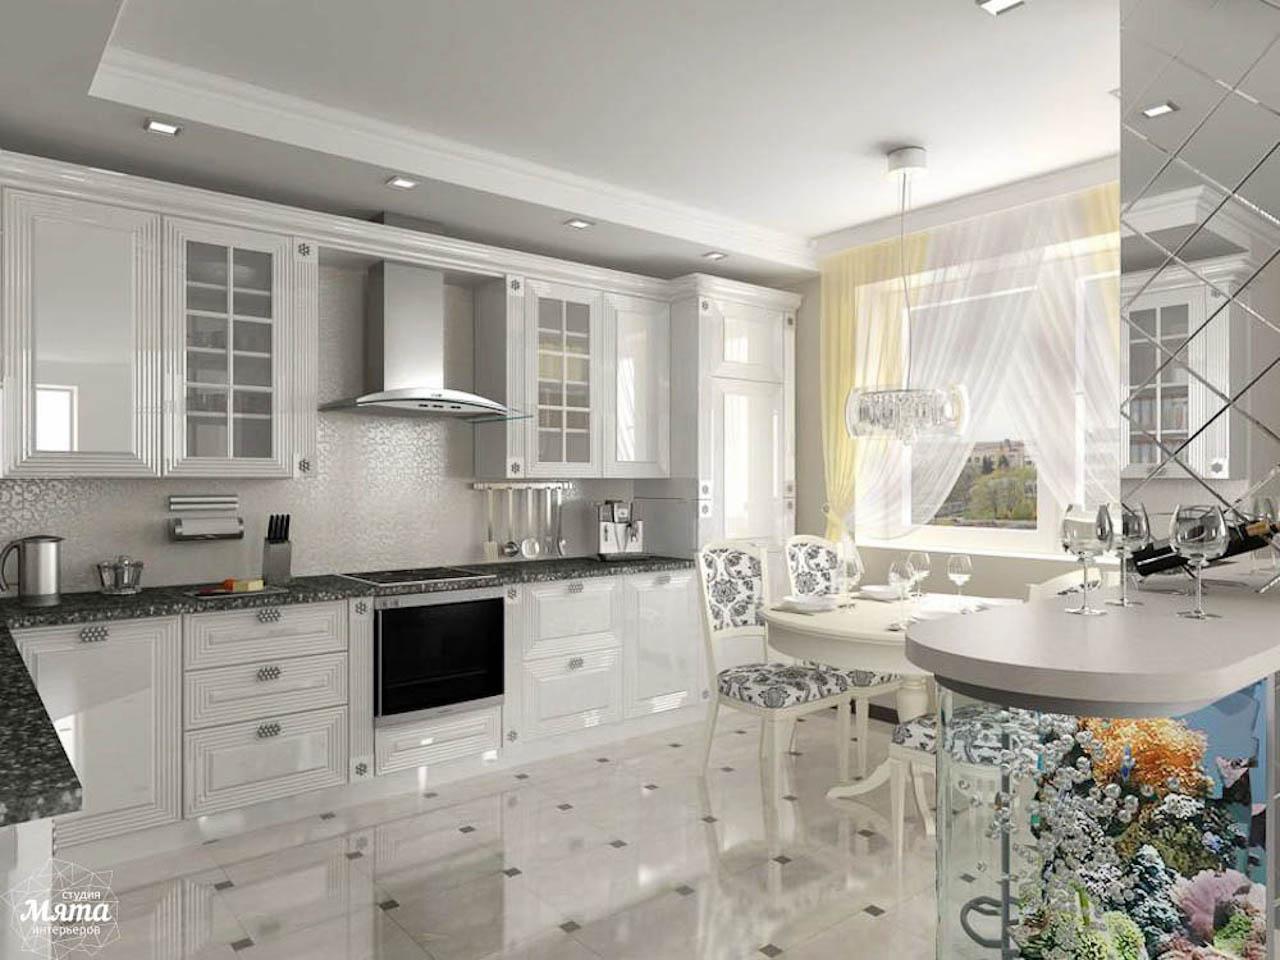 Дизайн интерьера двухкомнатной квартиры по ул. Юмашева 10 img848984988